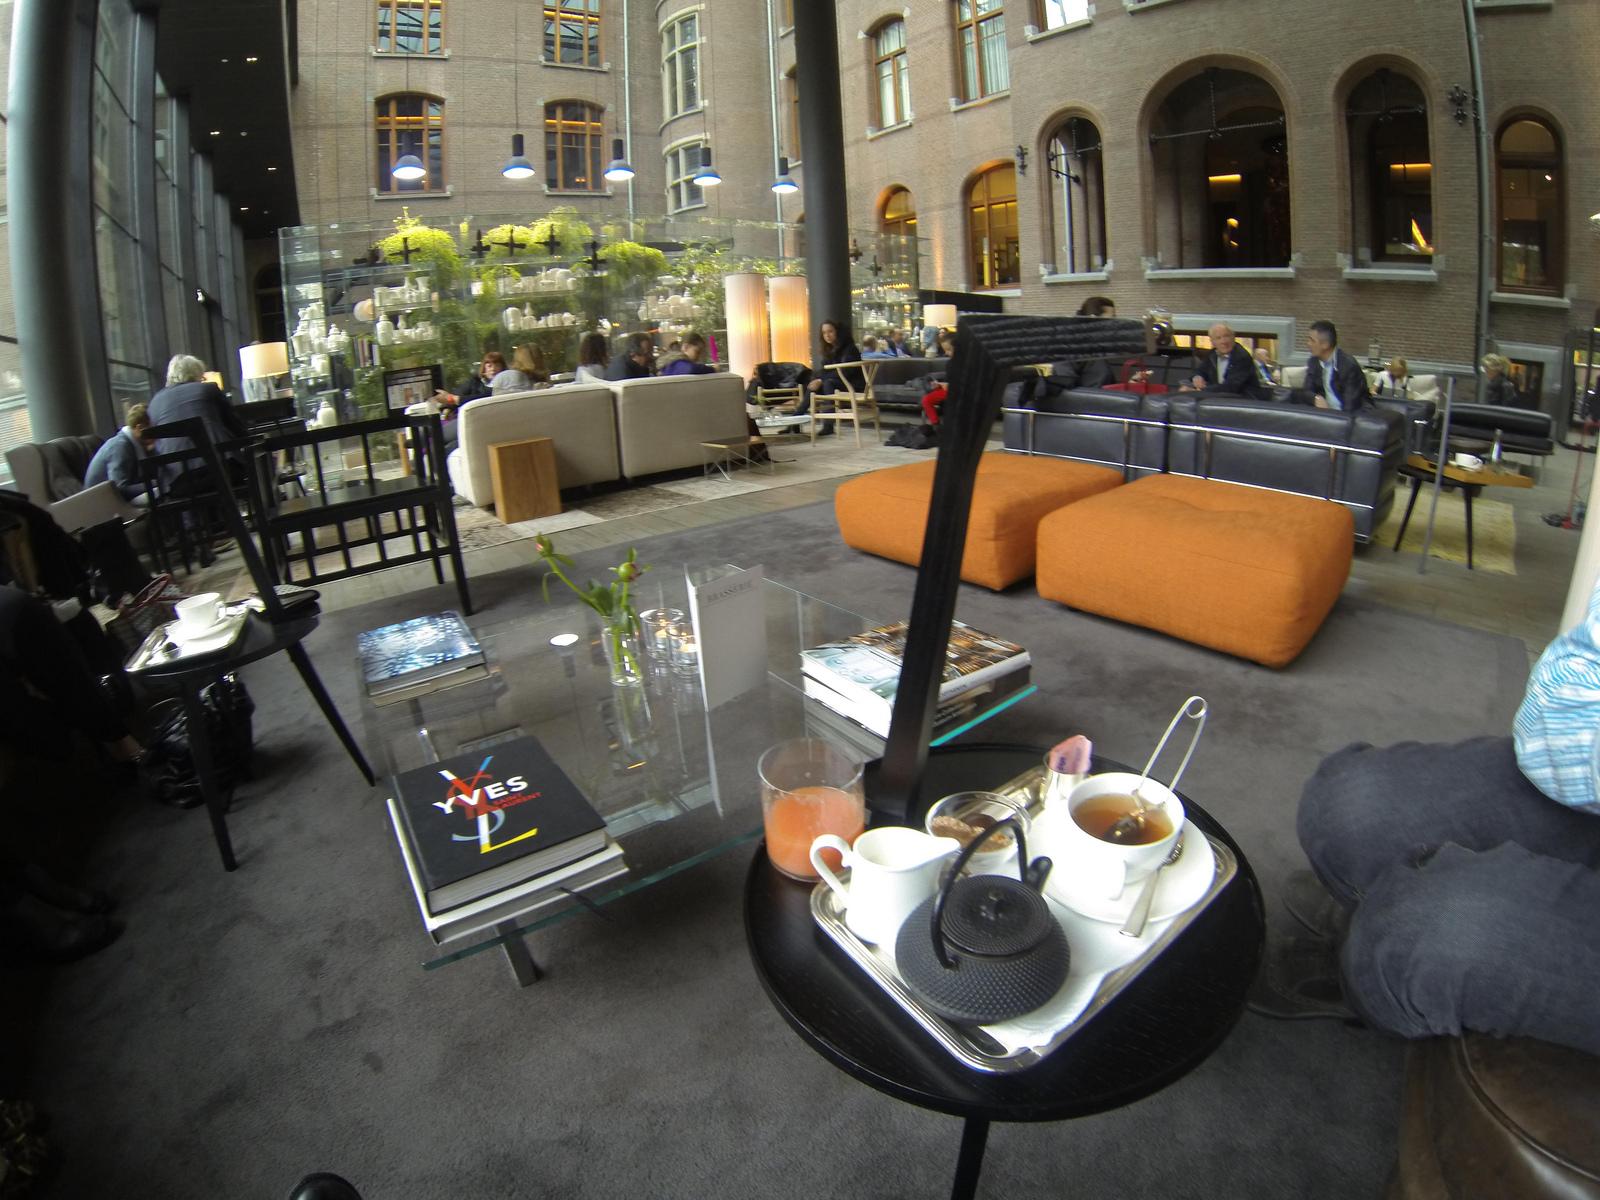 lobby-refreshments-in-Conservatorium-Hotel-Amsterdam.jpg